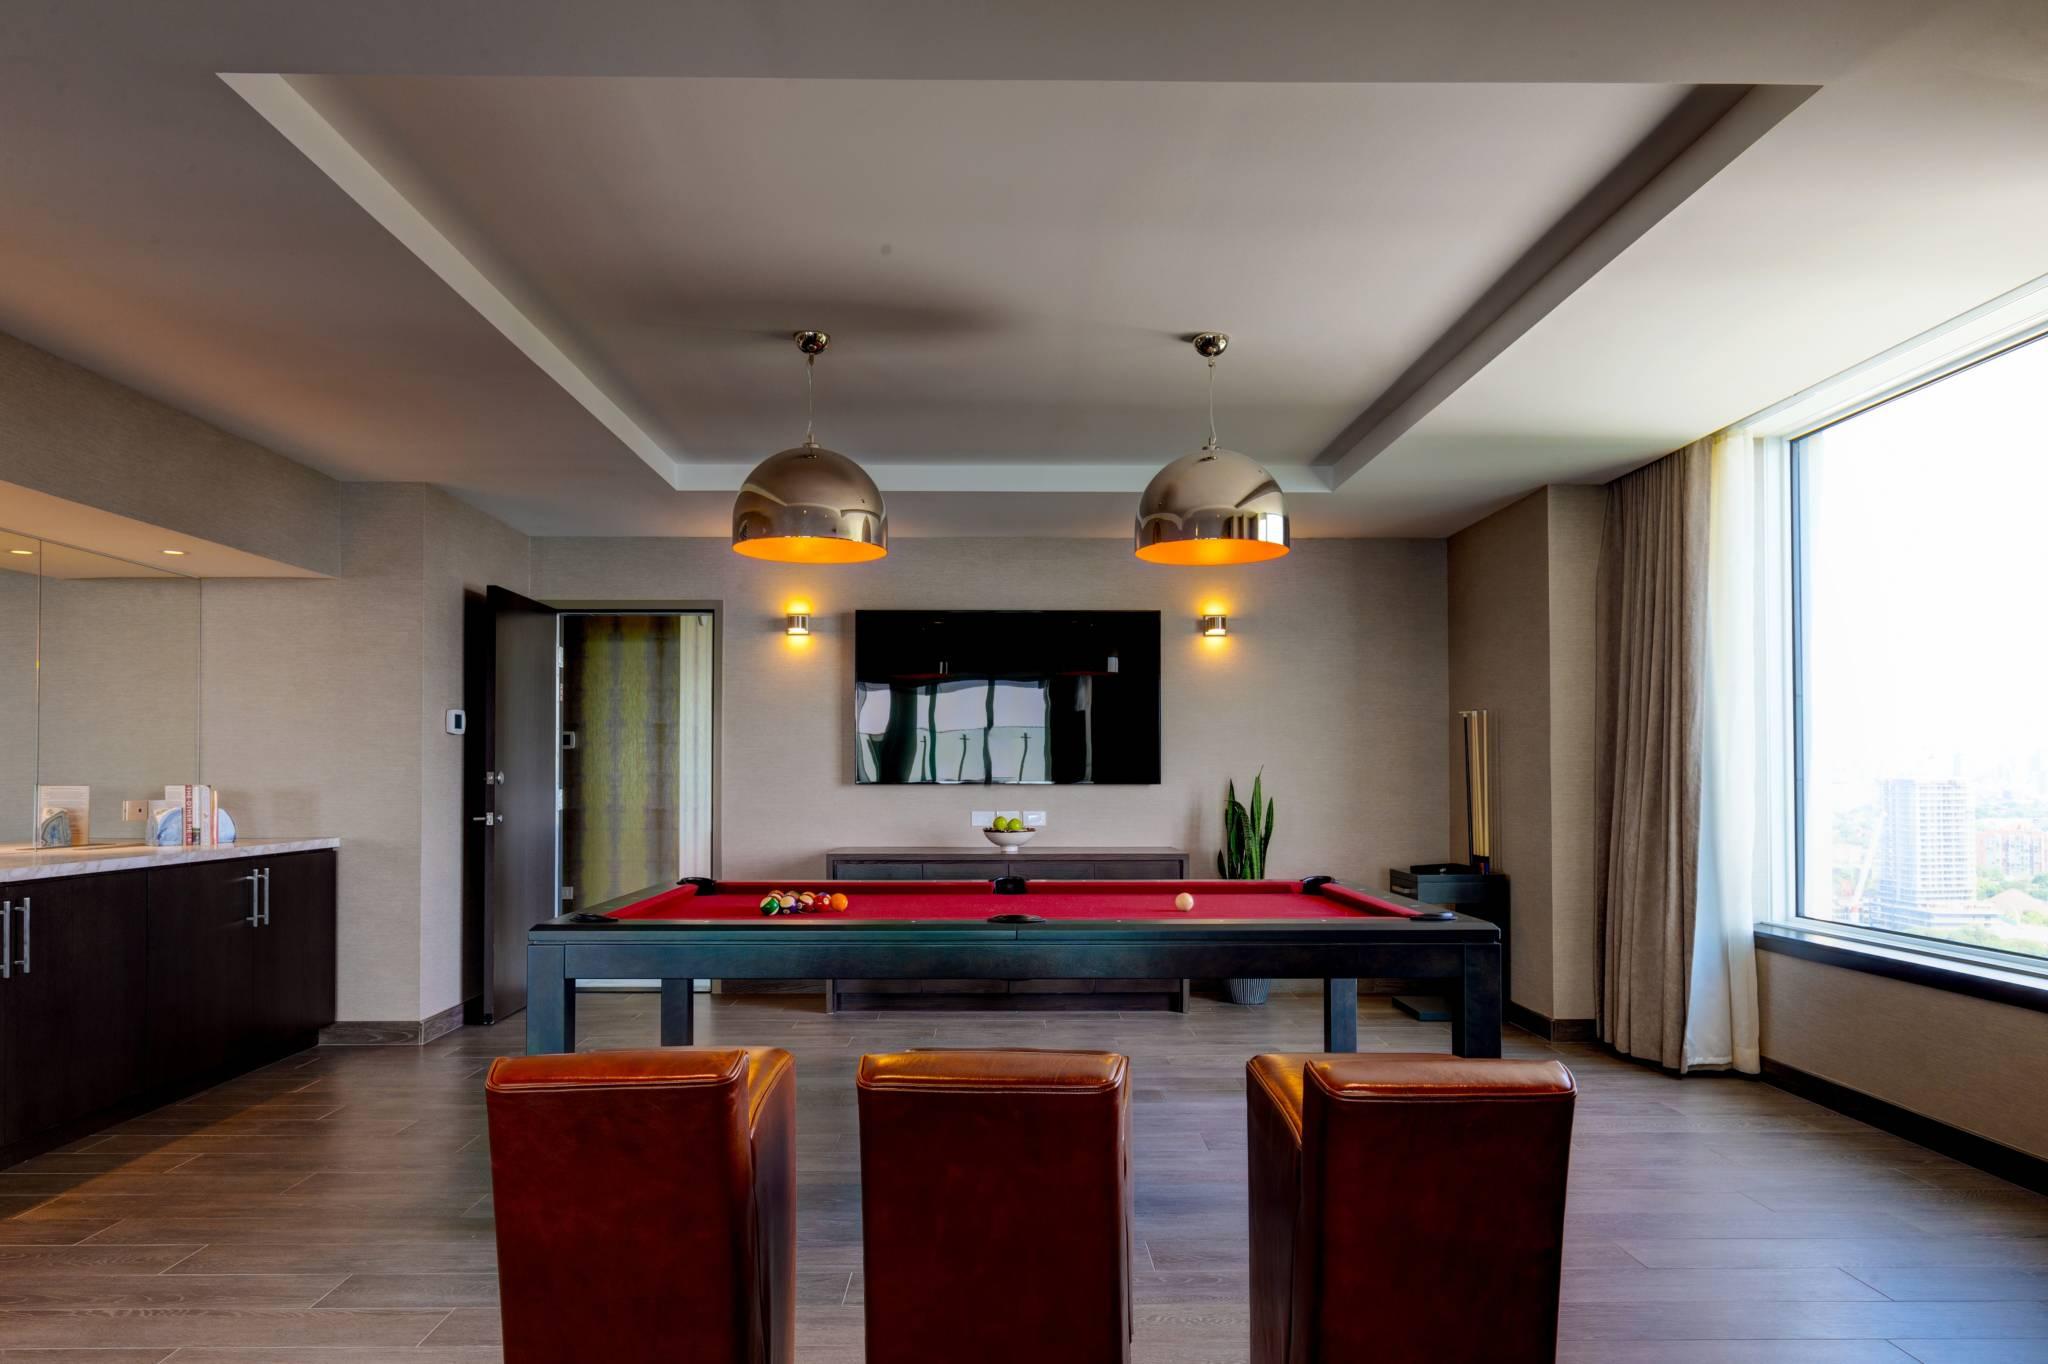 6000 a night toronto hotel x 4